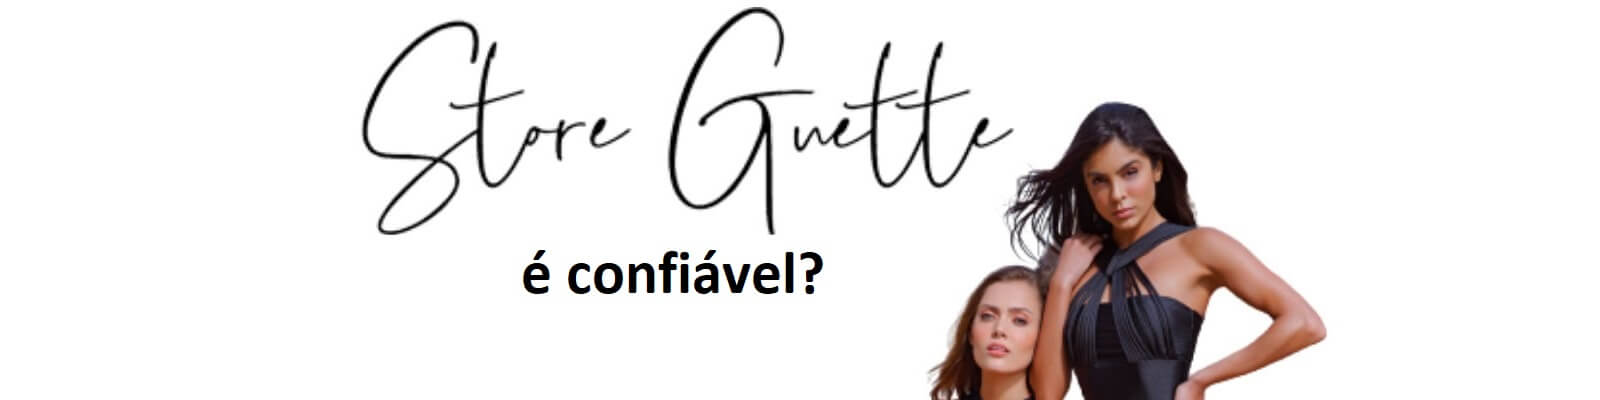 "Store Guette é confiável? Descubra!<span class=""wtr-time-wrap after-title""><span class=""wtr-time-number"">6</span> minutos de leitura</span>"